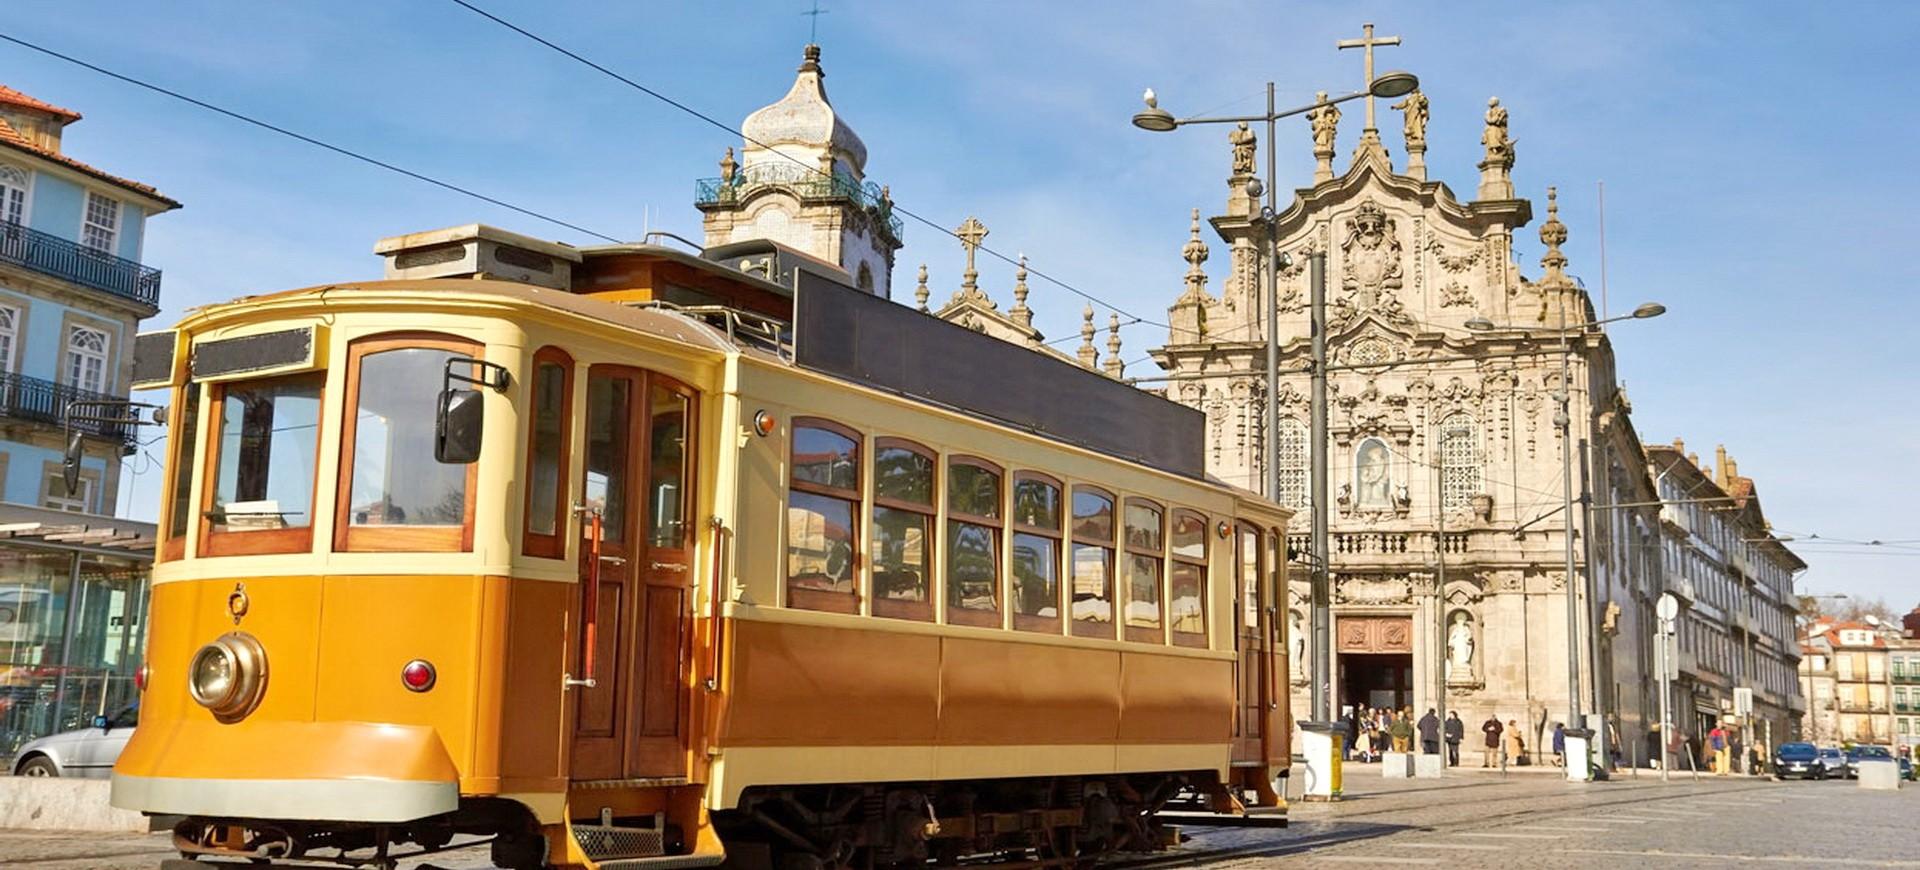 Portugal Porto Trame devant Eglise